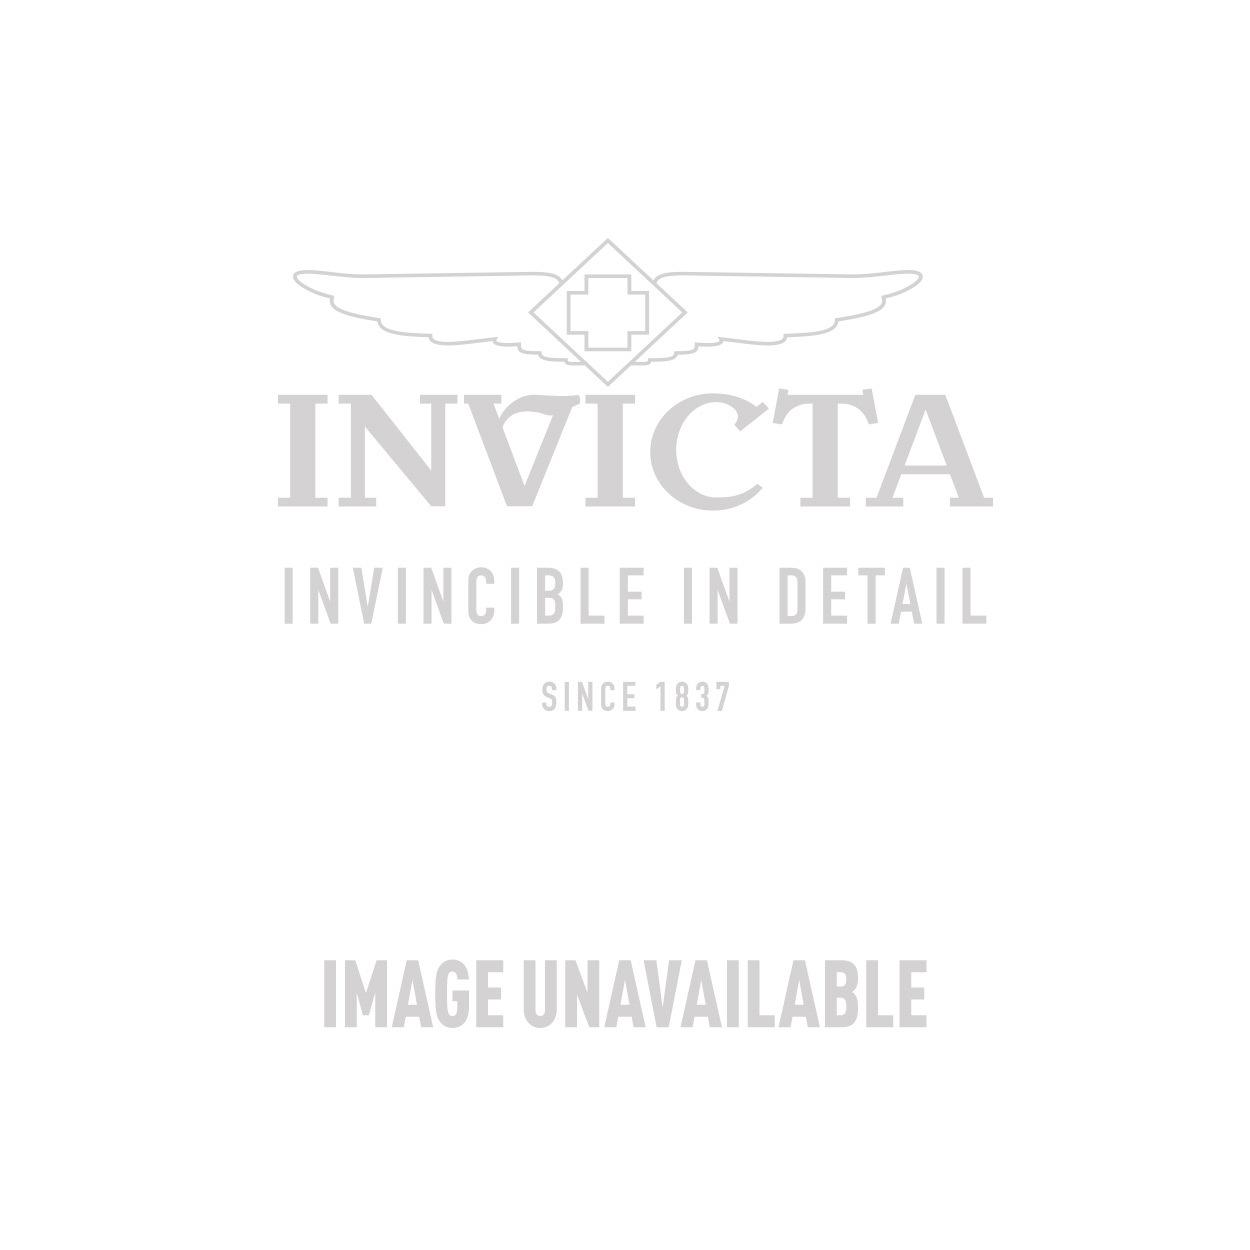 Invicta Pro Diver Swiss Movement Quartz Watch